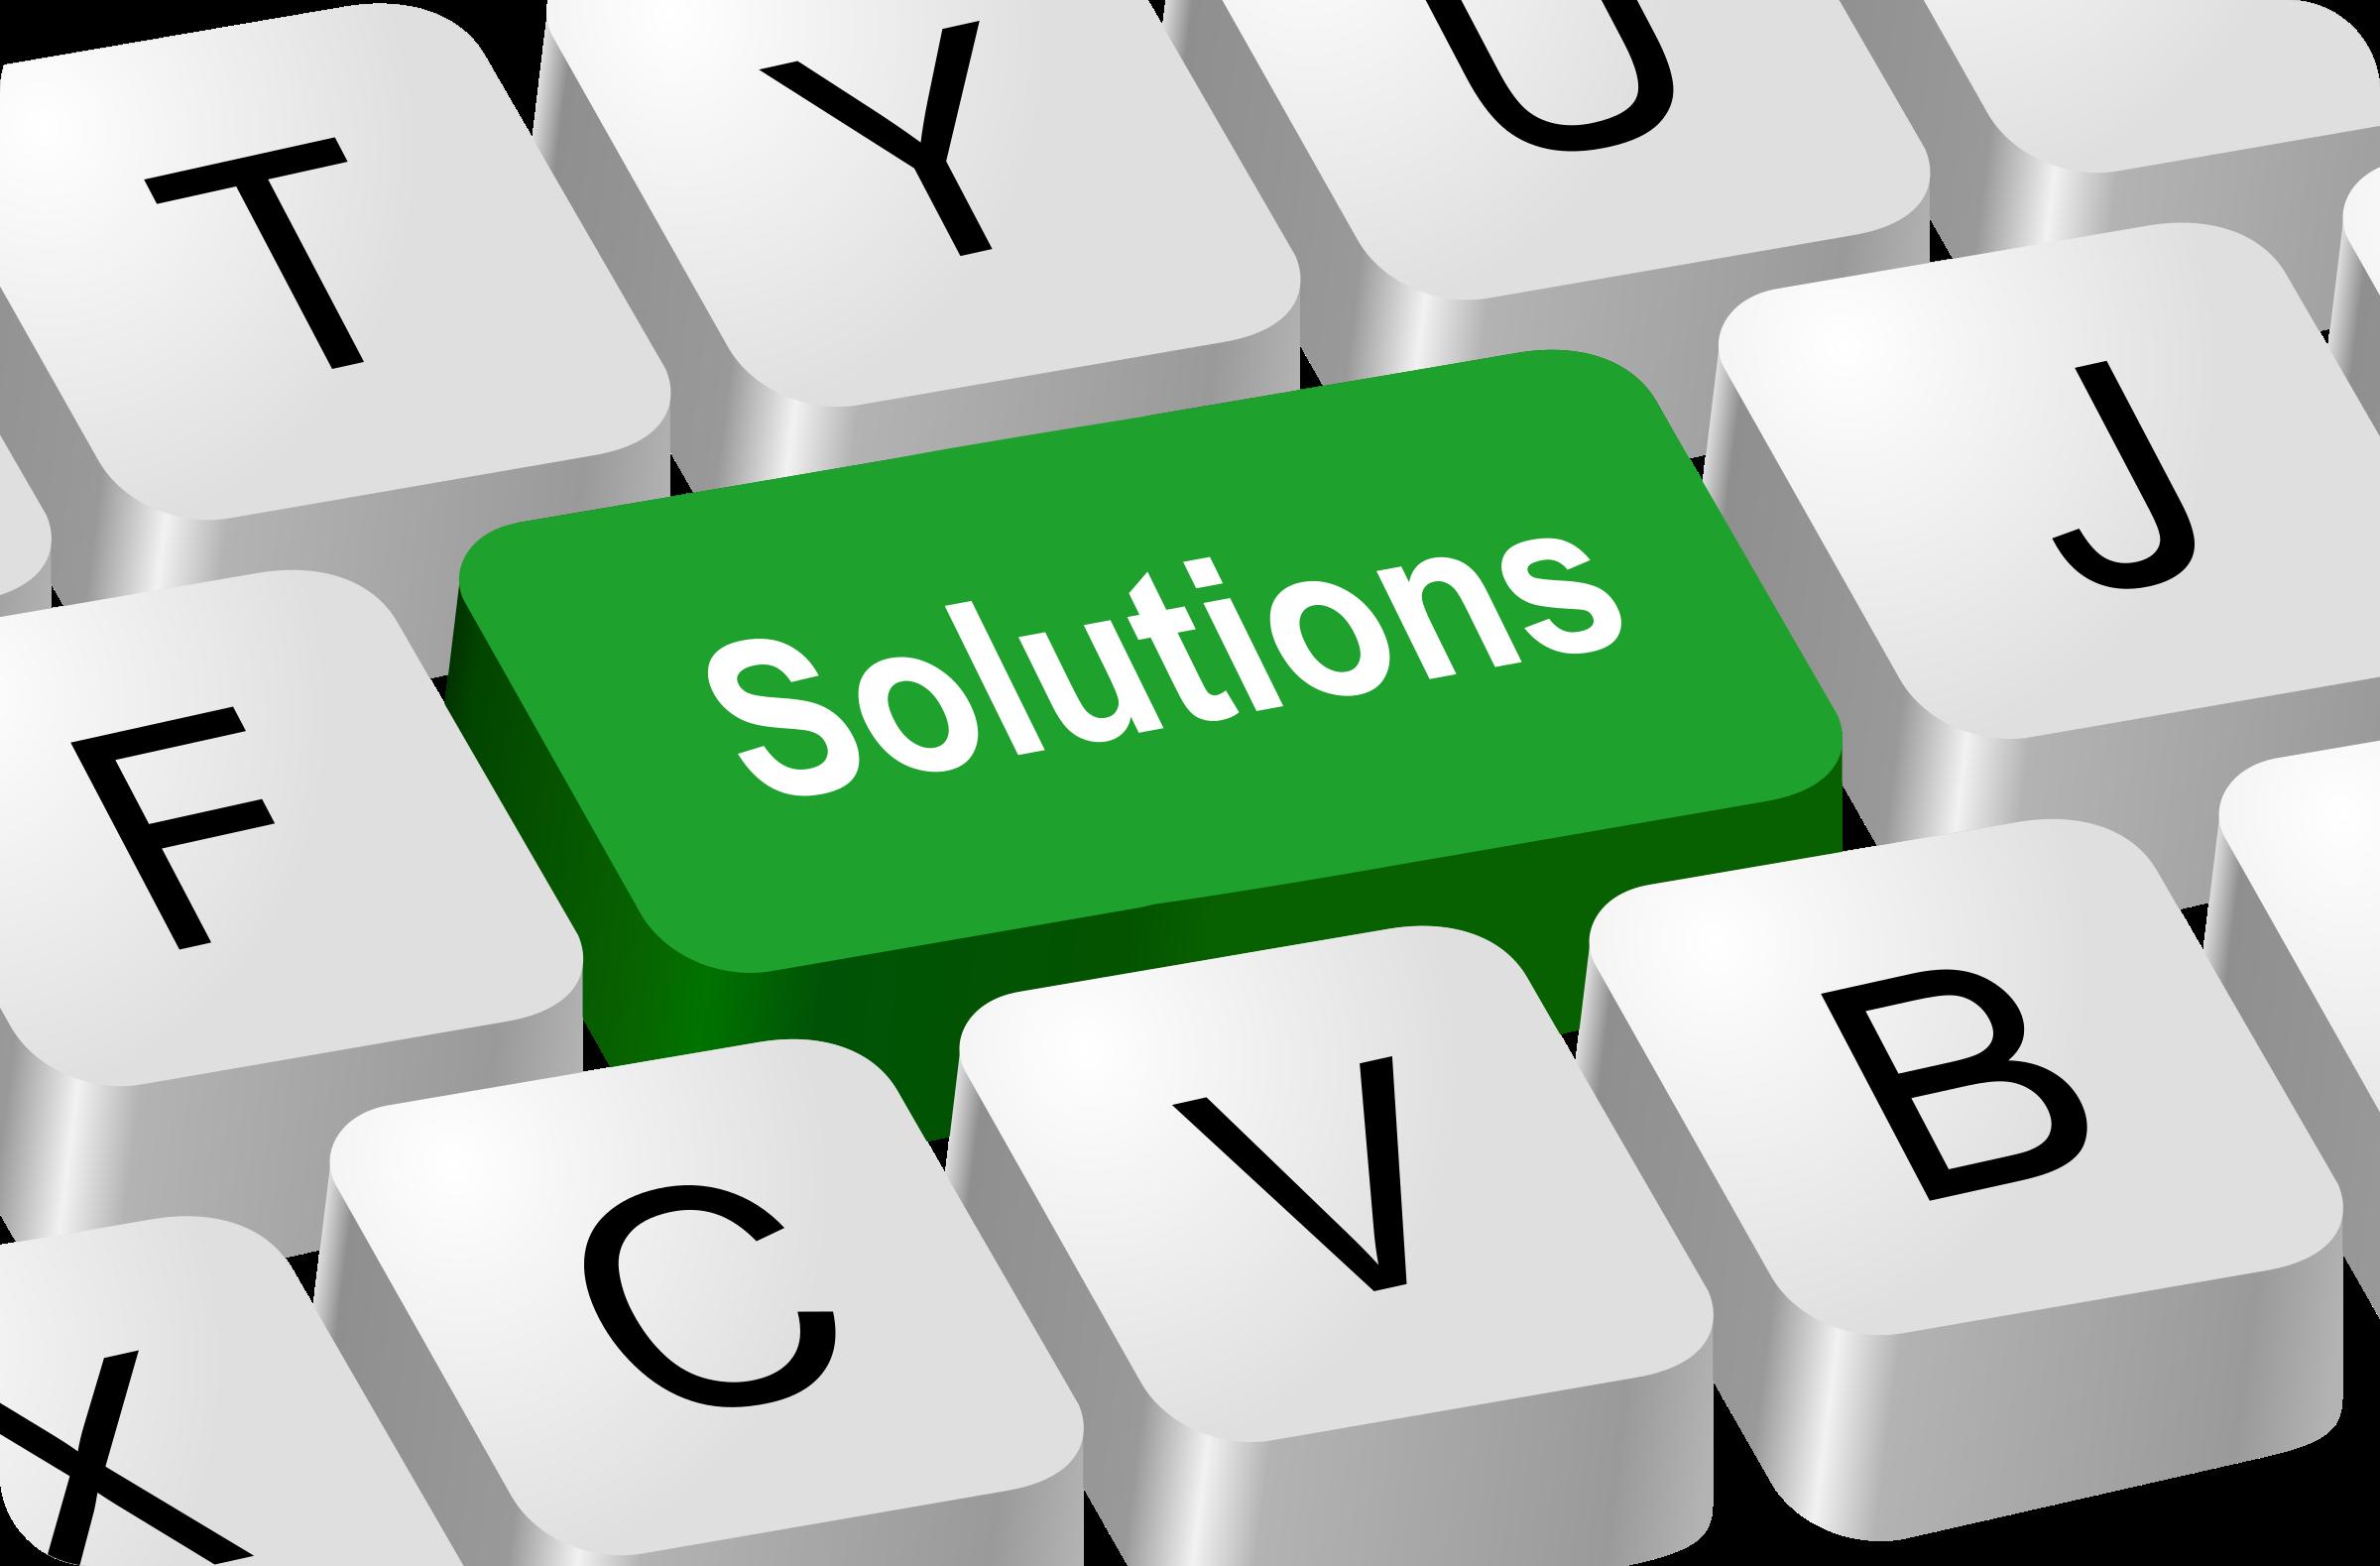 Find Solution Clip Art